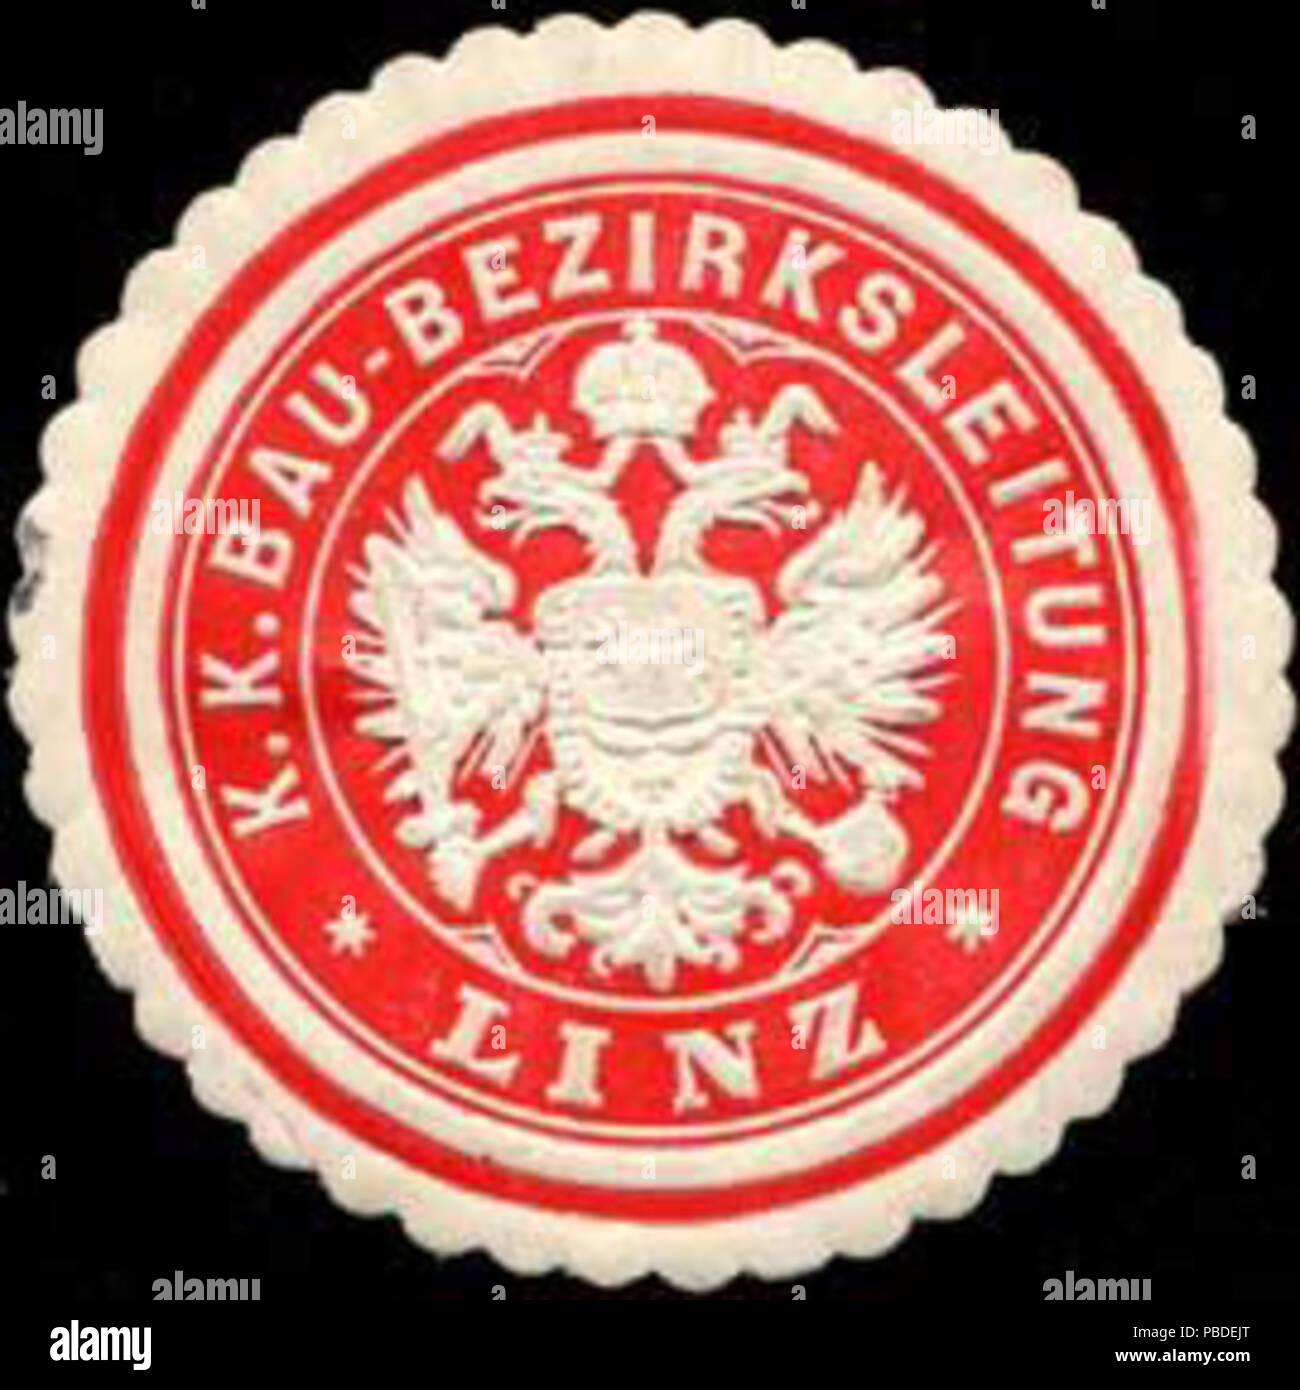 1419 Siegelmarke K.K. Bau-Bezirksleitung Linz W0316975